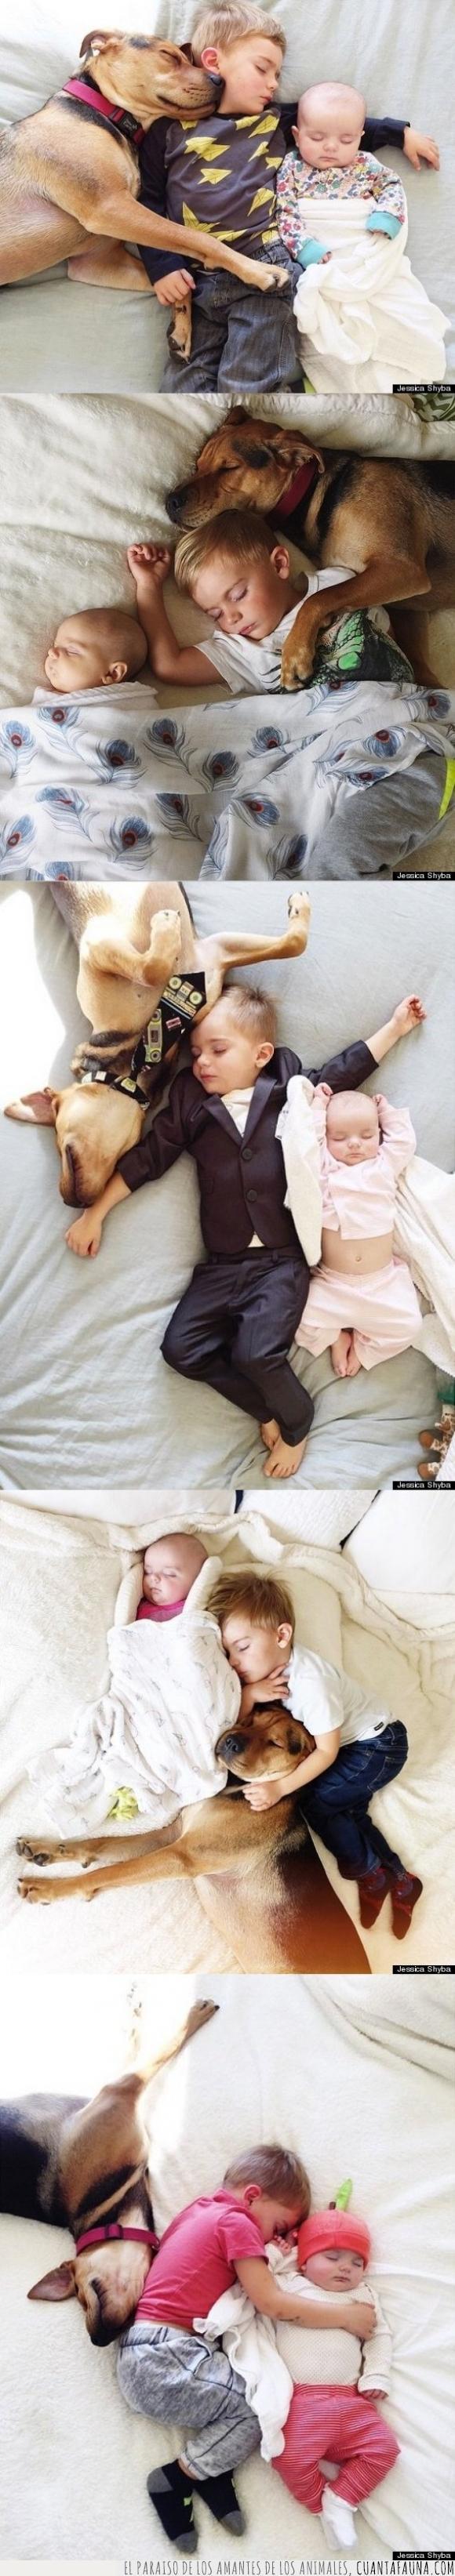 Beau,cama,dormir,hermana,hermano,Jessica Shyba,perro,siesta,Theo